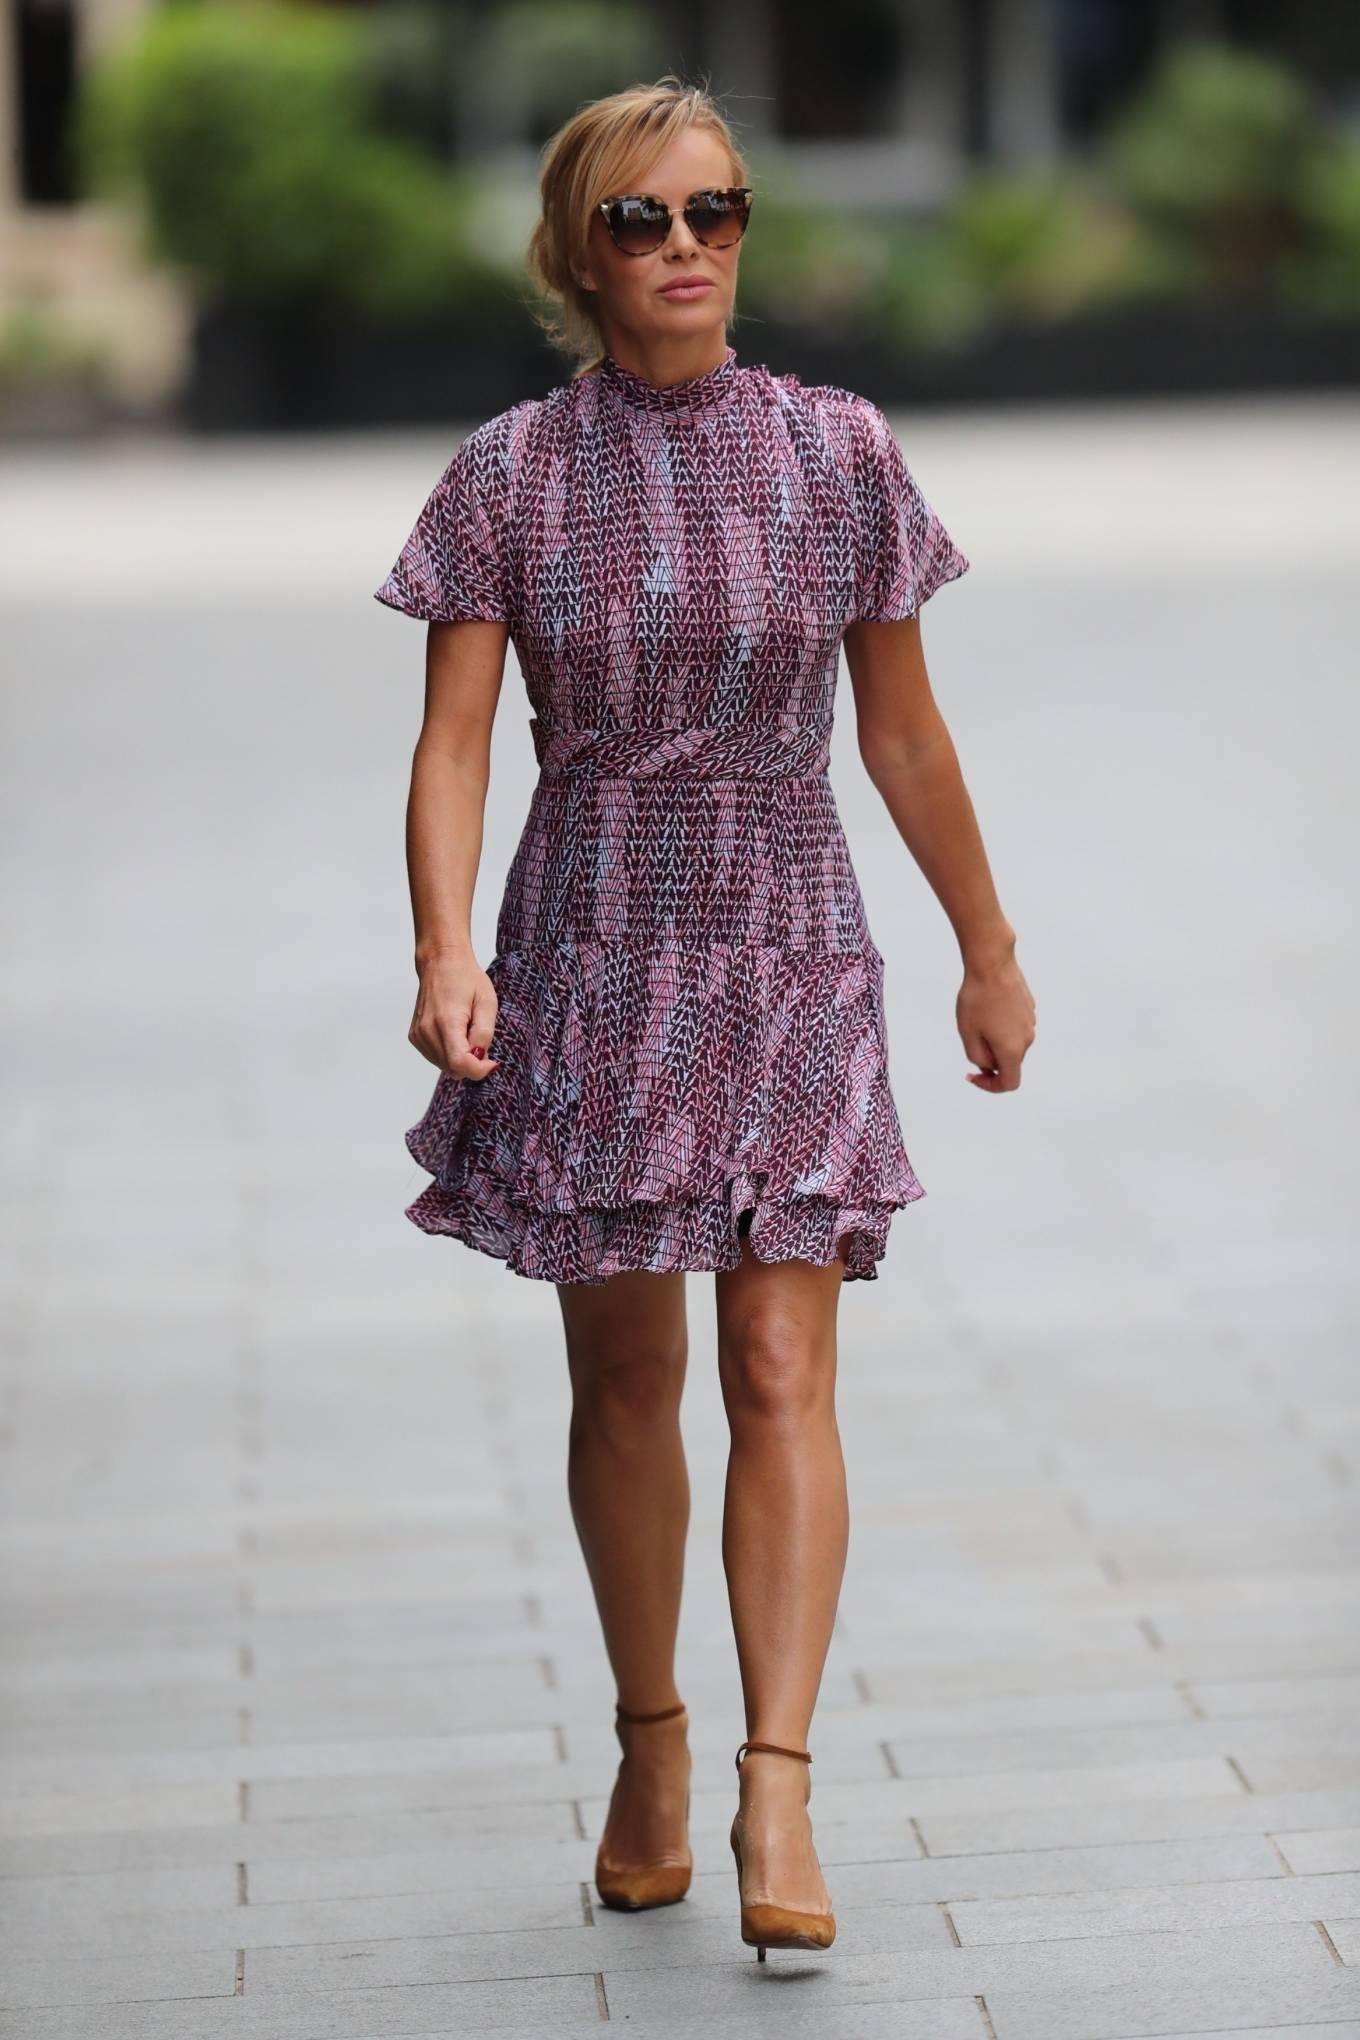 Amanda Holden 2020 : Amanda Holden – In a layered ruffle mini dress at Heart Radio Studios in London -09